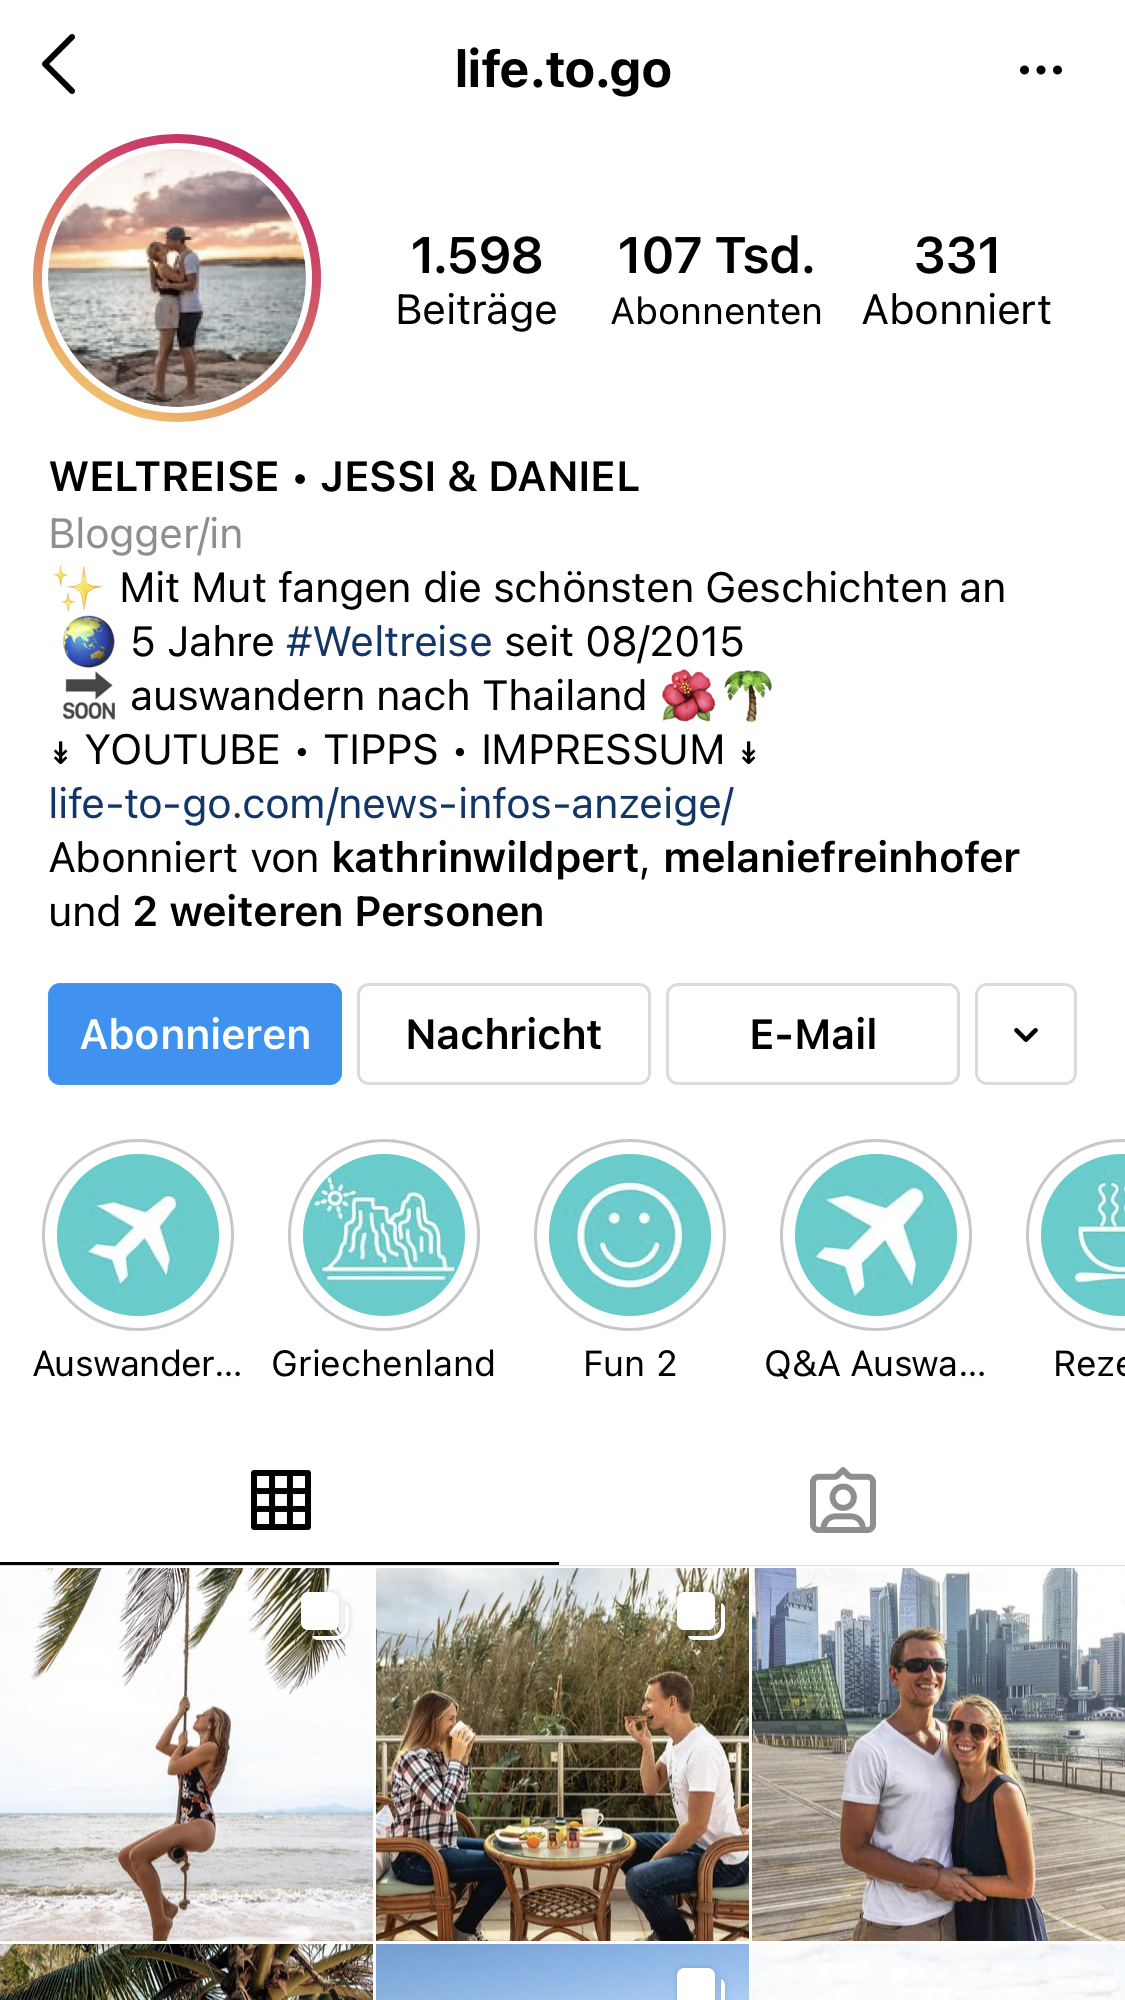 life.to.go Instagram Account Screenshot